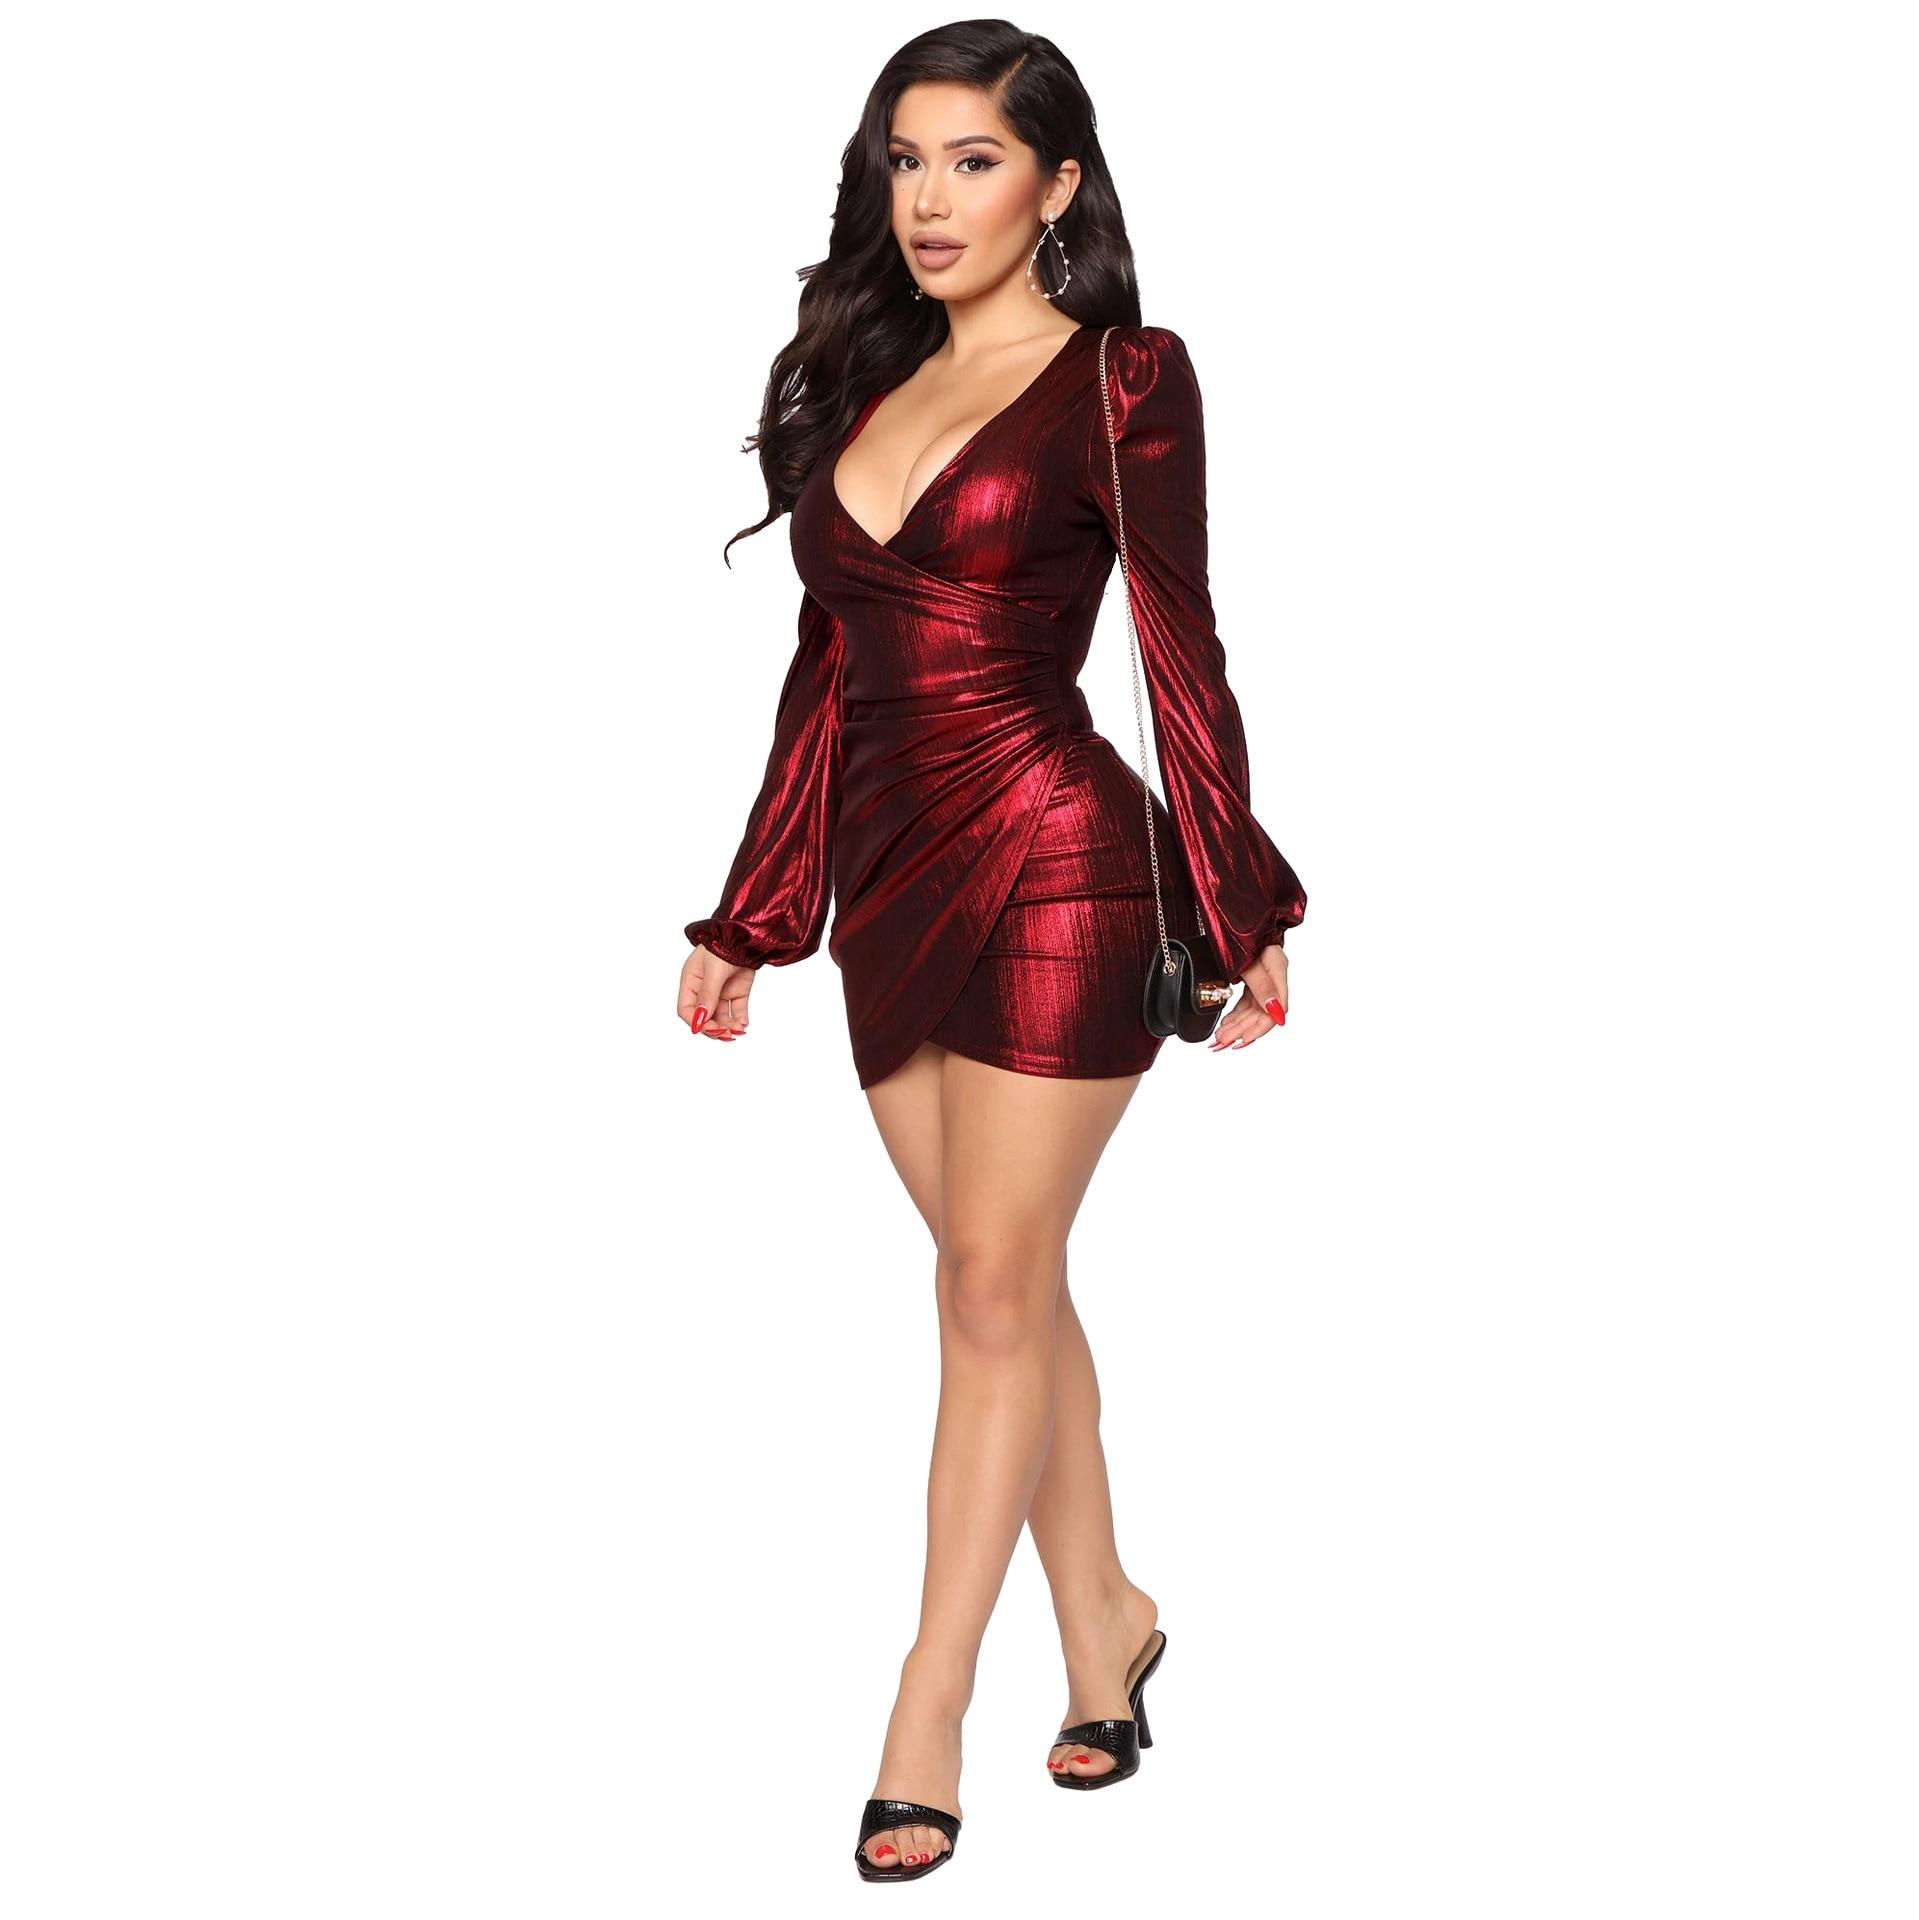 Shiny Bronzing Ribbed Elegant Bandage Dress Women Sexy Deep V Neck Long Sleeve Ruched Dresses Vintage High Waist Slim Fit Dress 8